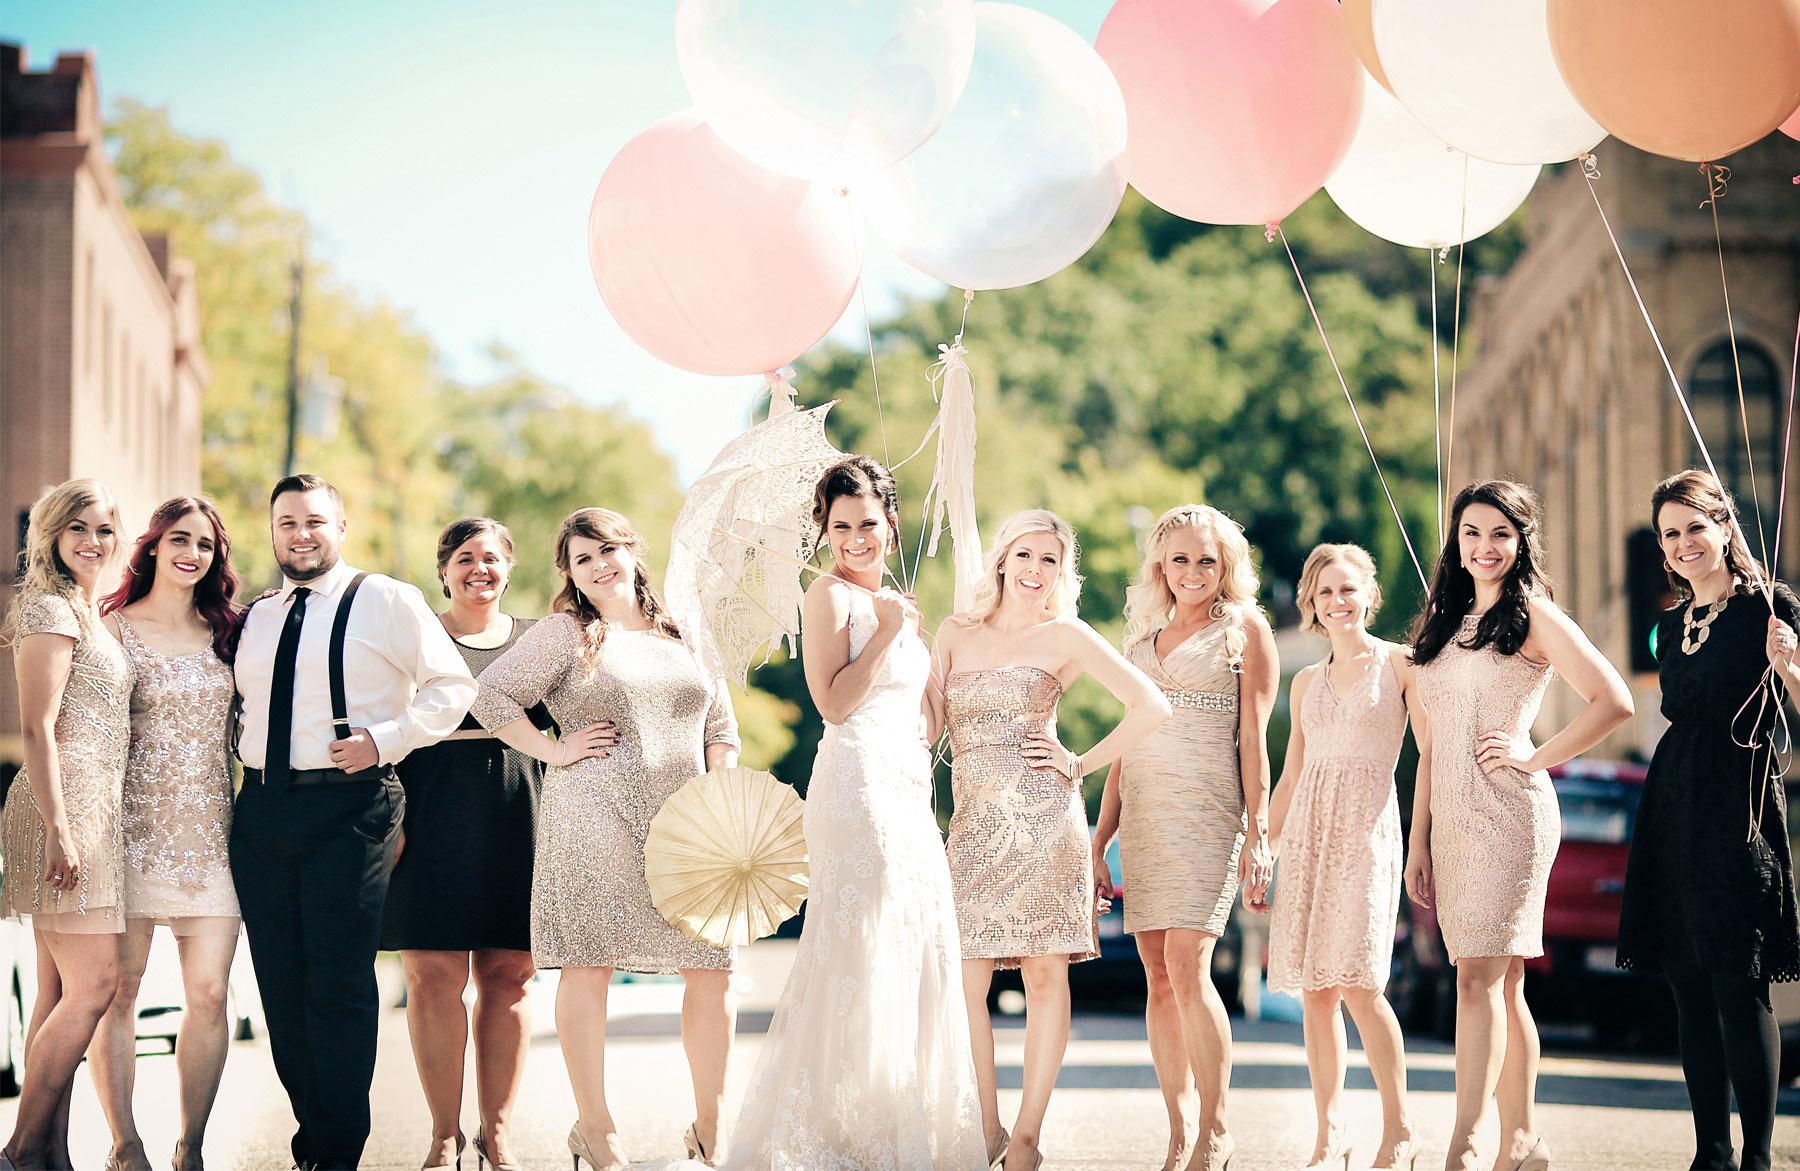 06-Stillwater-Minnesota-Wedding-Photography-by-Vick-Photography-Giant-Balloons-Kick-Up-Your-Heels-Bridesmaids-Tara-&-Ryan.jpg